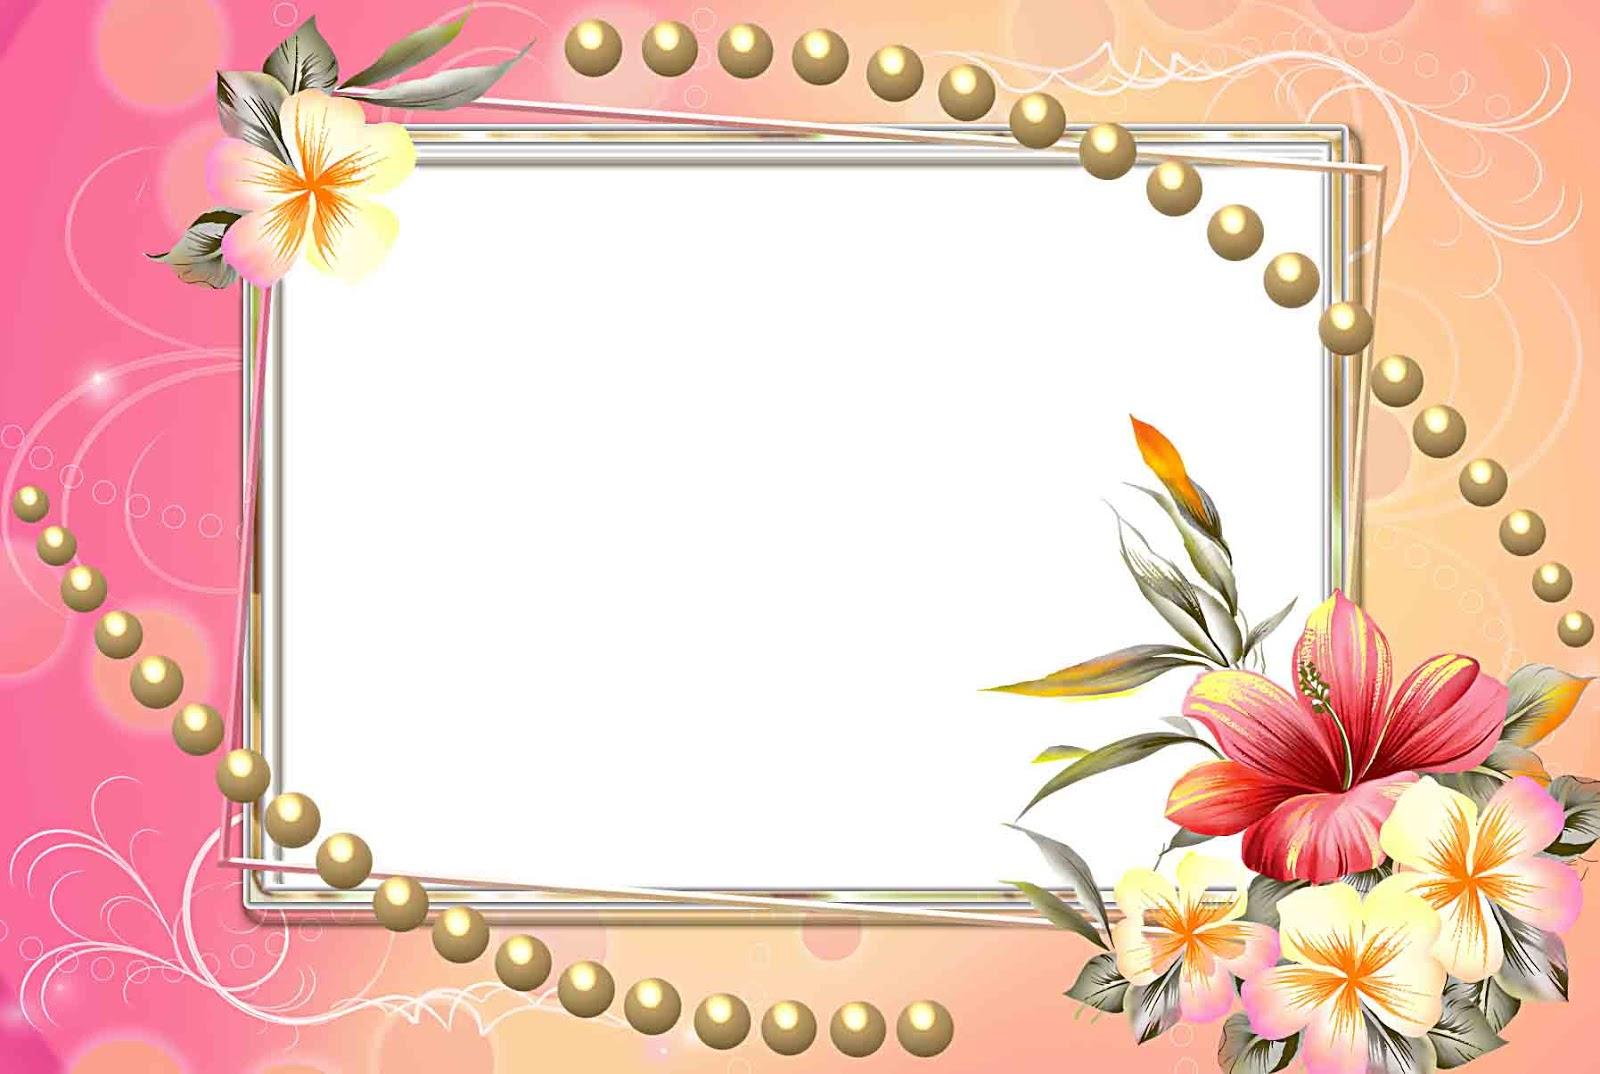 Photoshop Frames Images HD Wallpaper - all 4u wallpaper